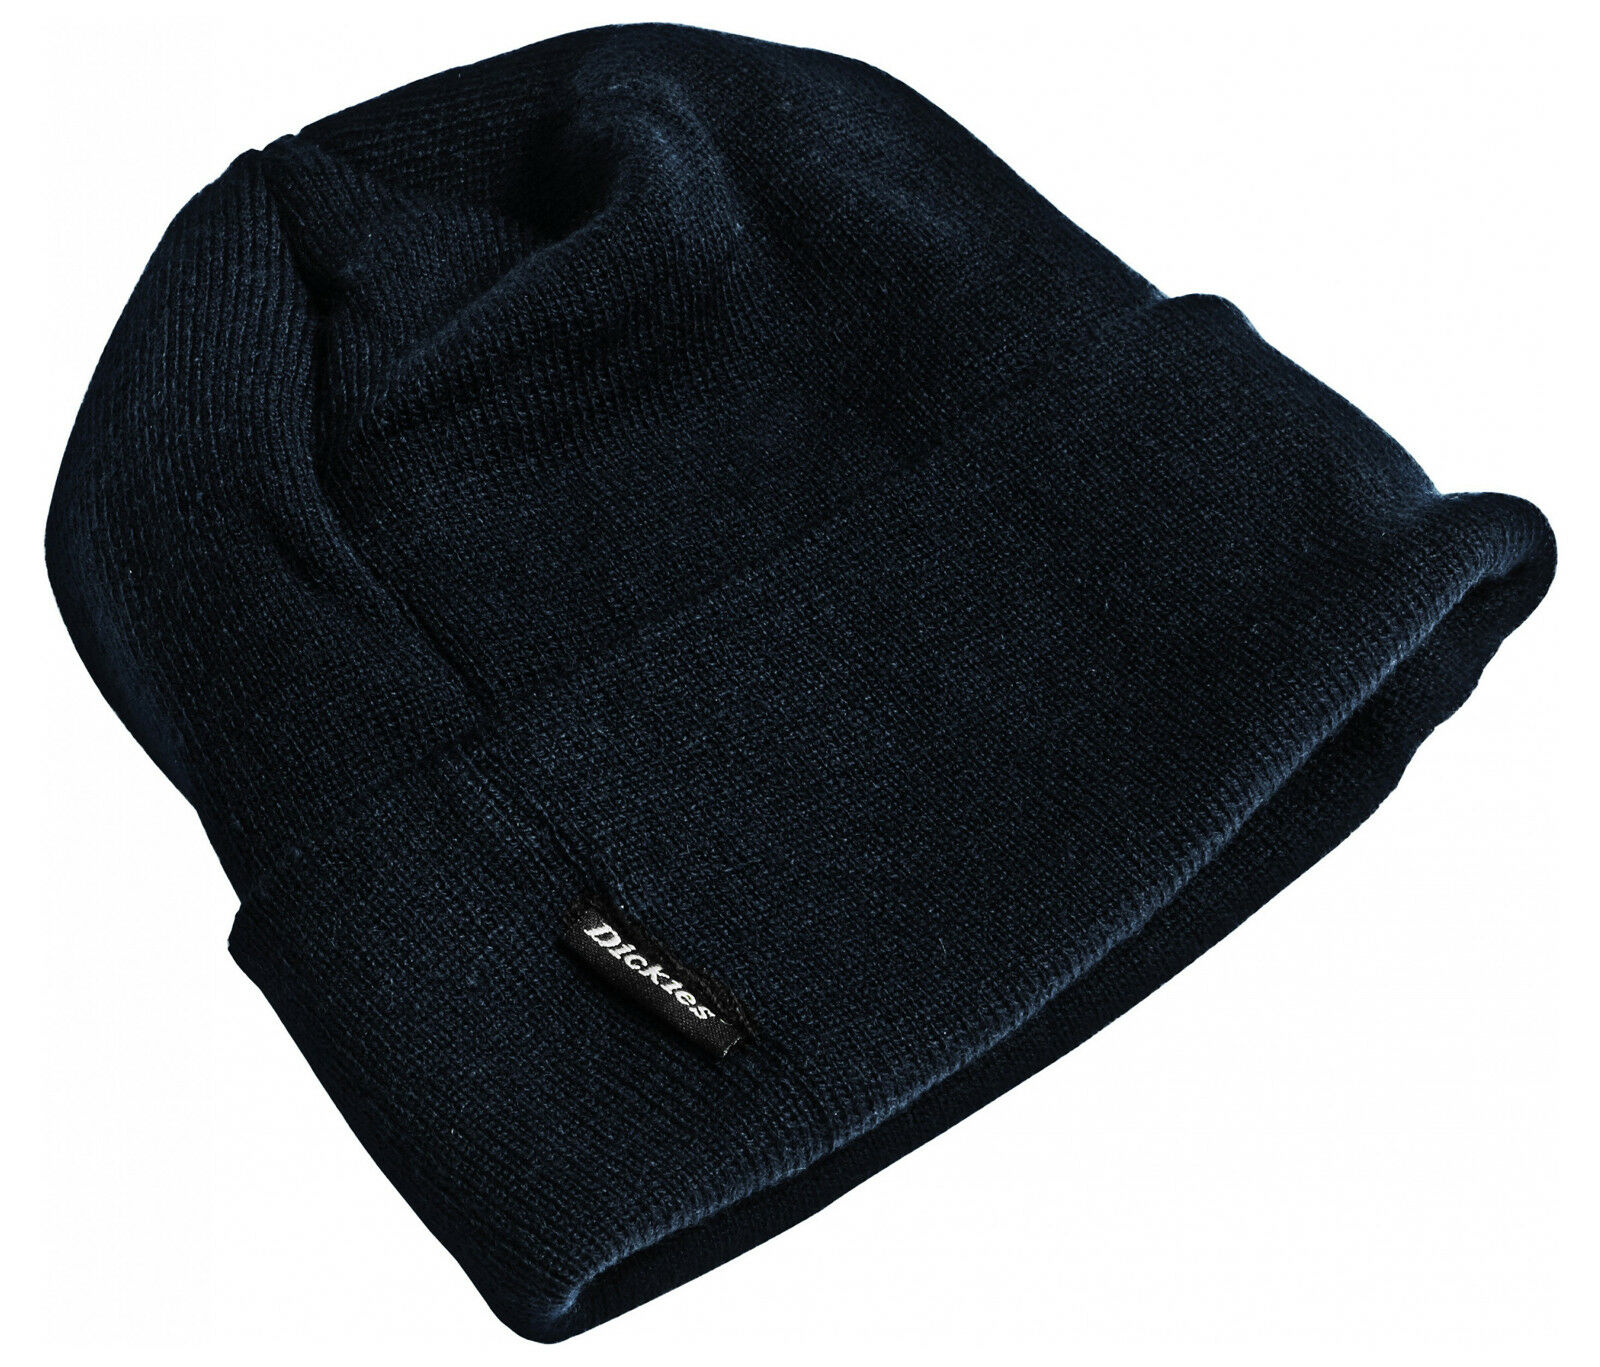 44f1809fc89 Dickies Watch Cap Thinsulate Mens Durable Winter Hat HA180